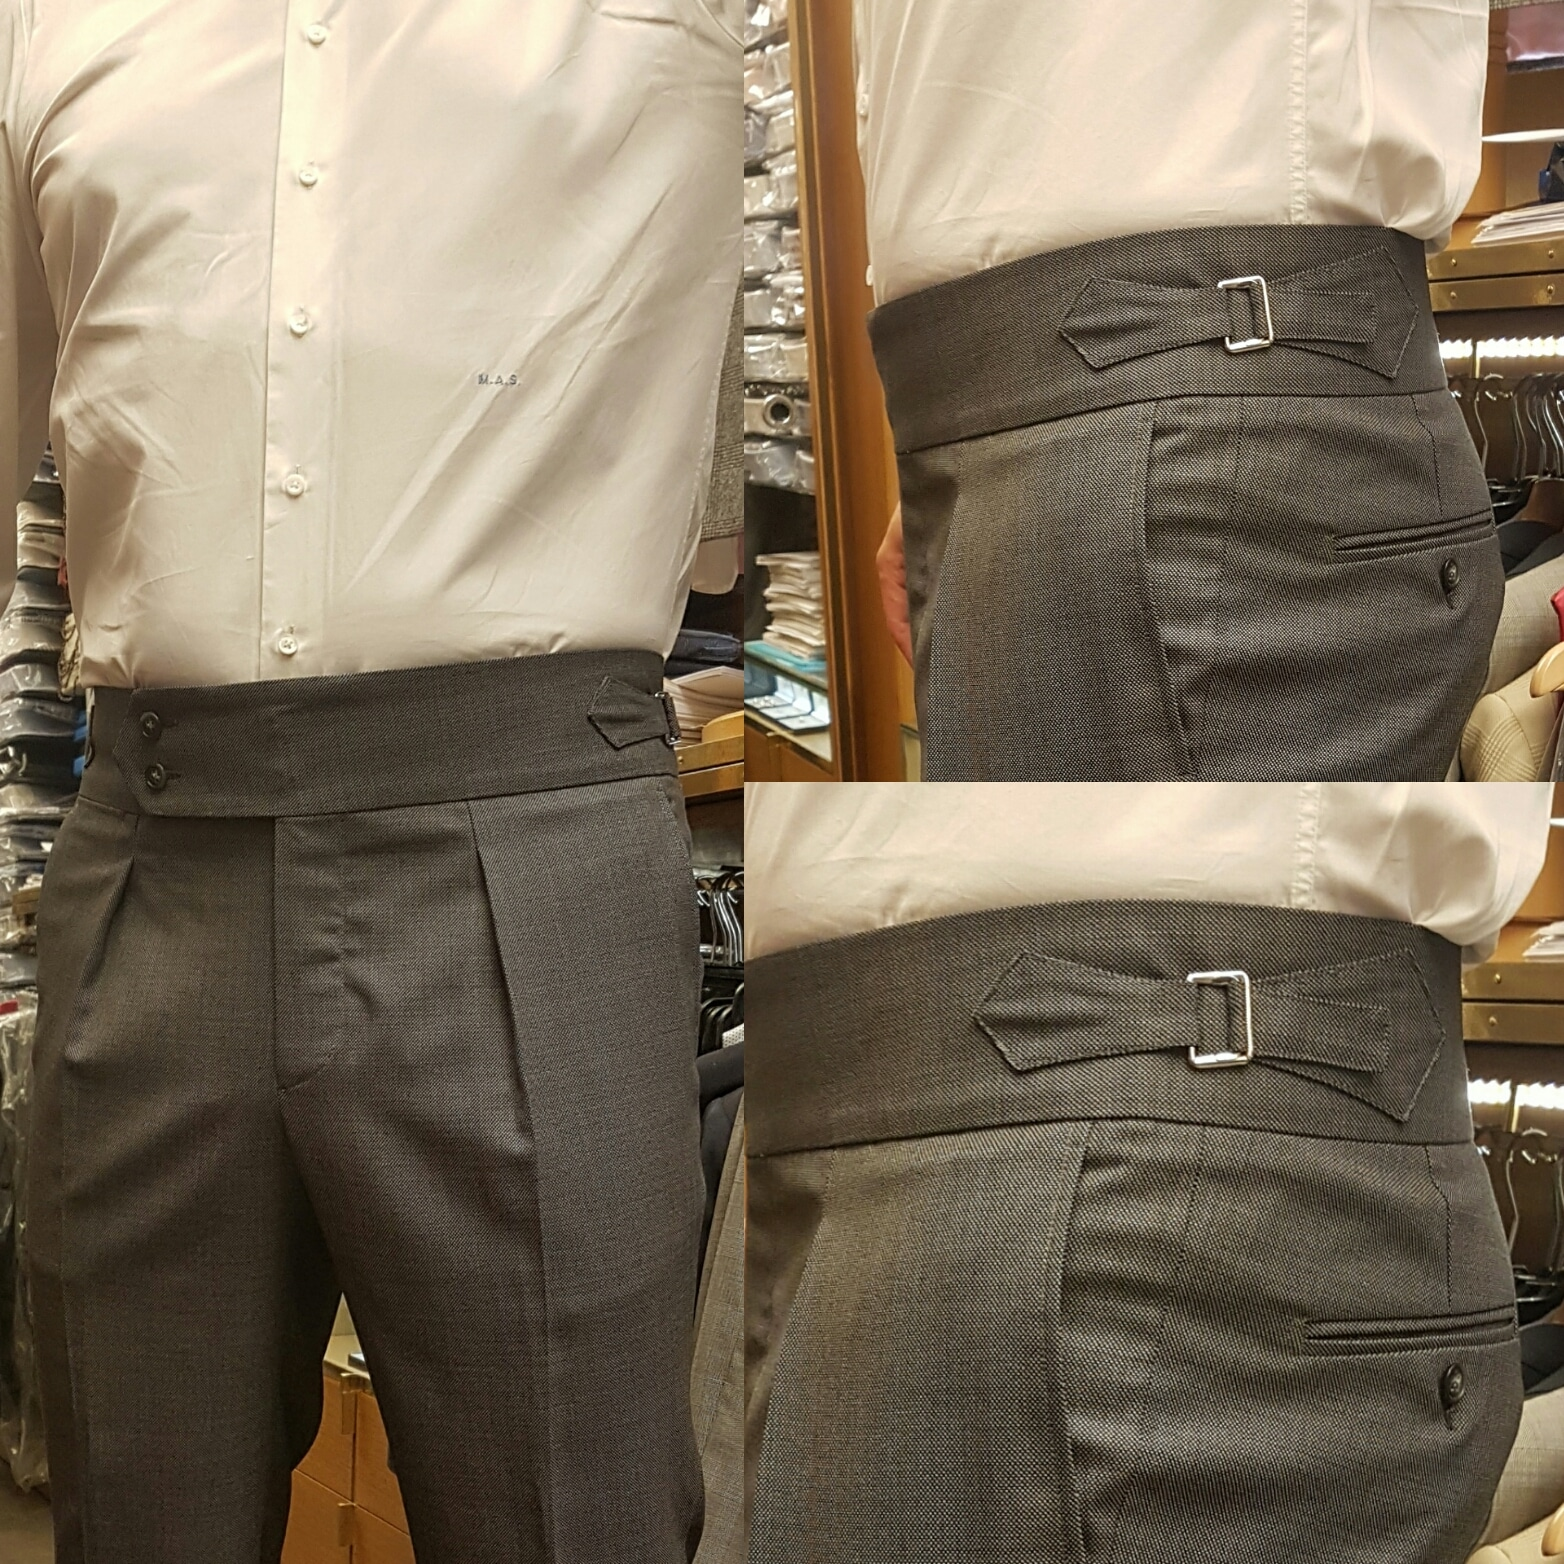 pantalon sur mesure patte de serrage